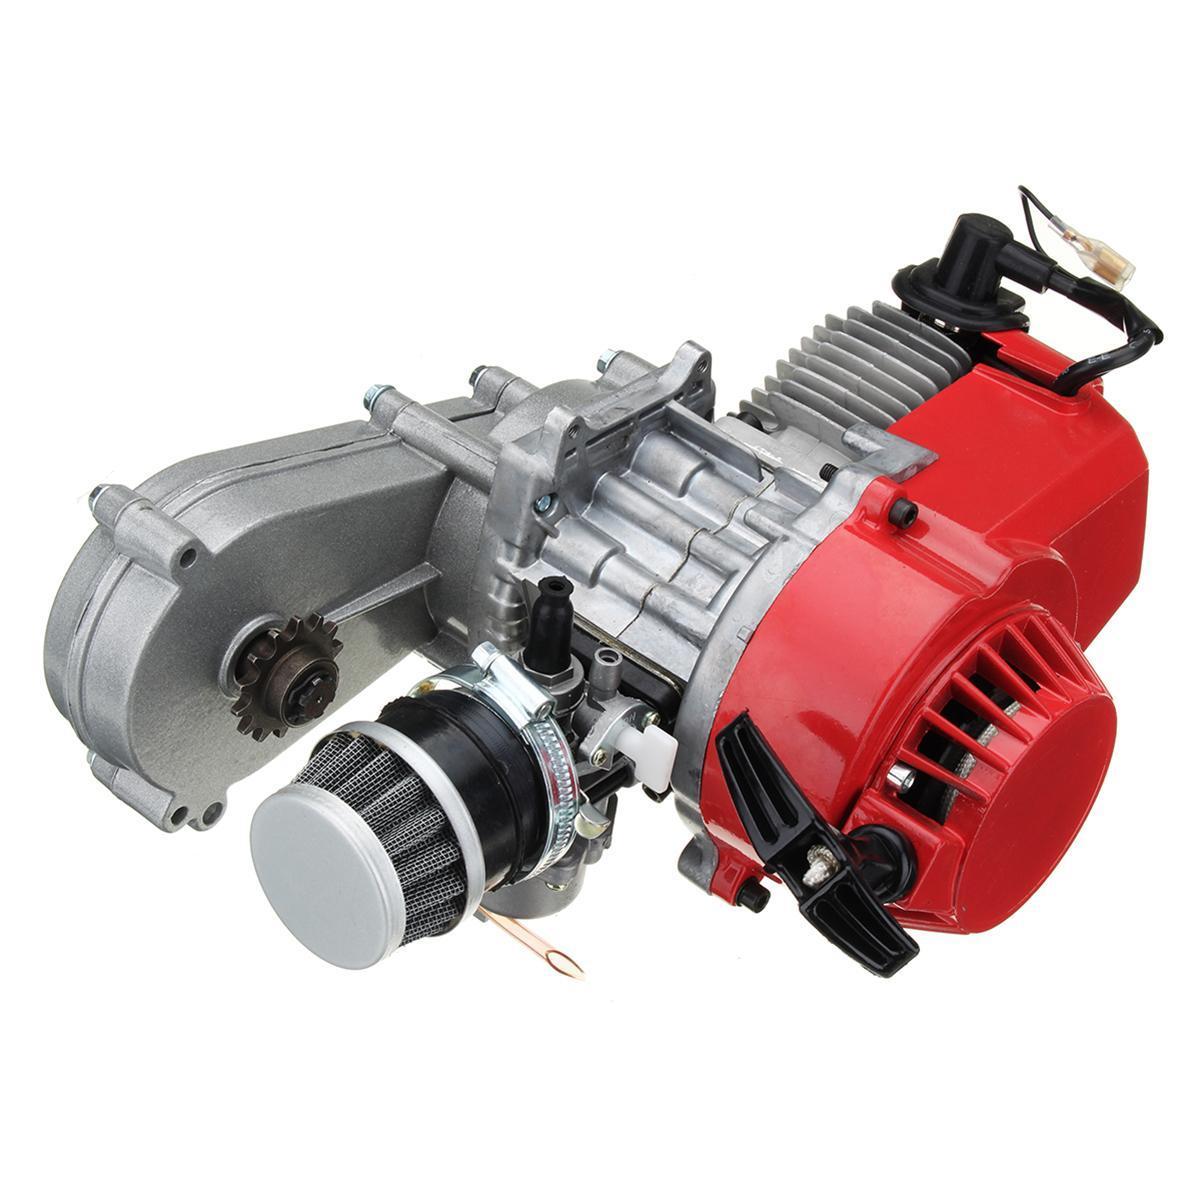 49cc MINIMOTO MINI MOTO DIRT BIKE QUAD ATV ENGINE CARBURETTOR PULLSTART COIL